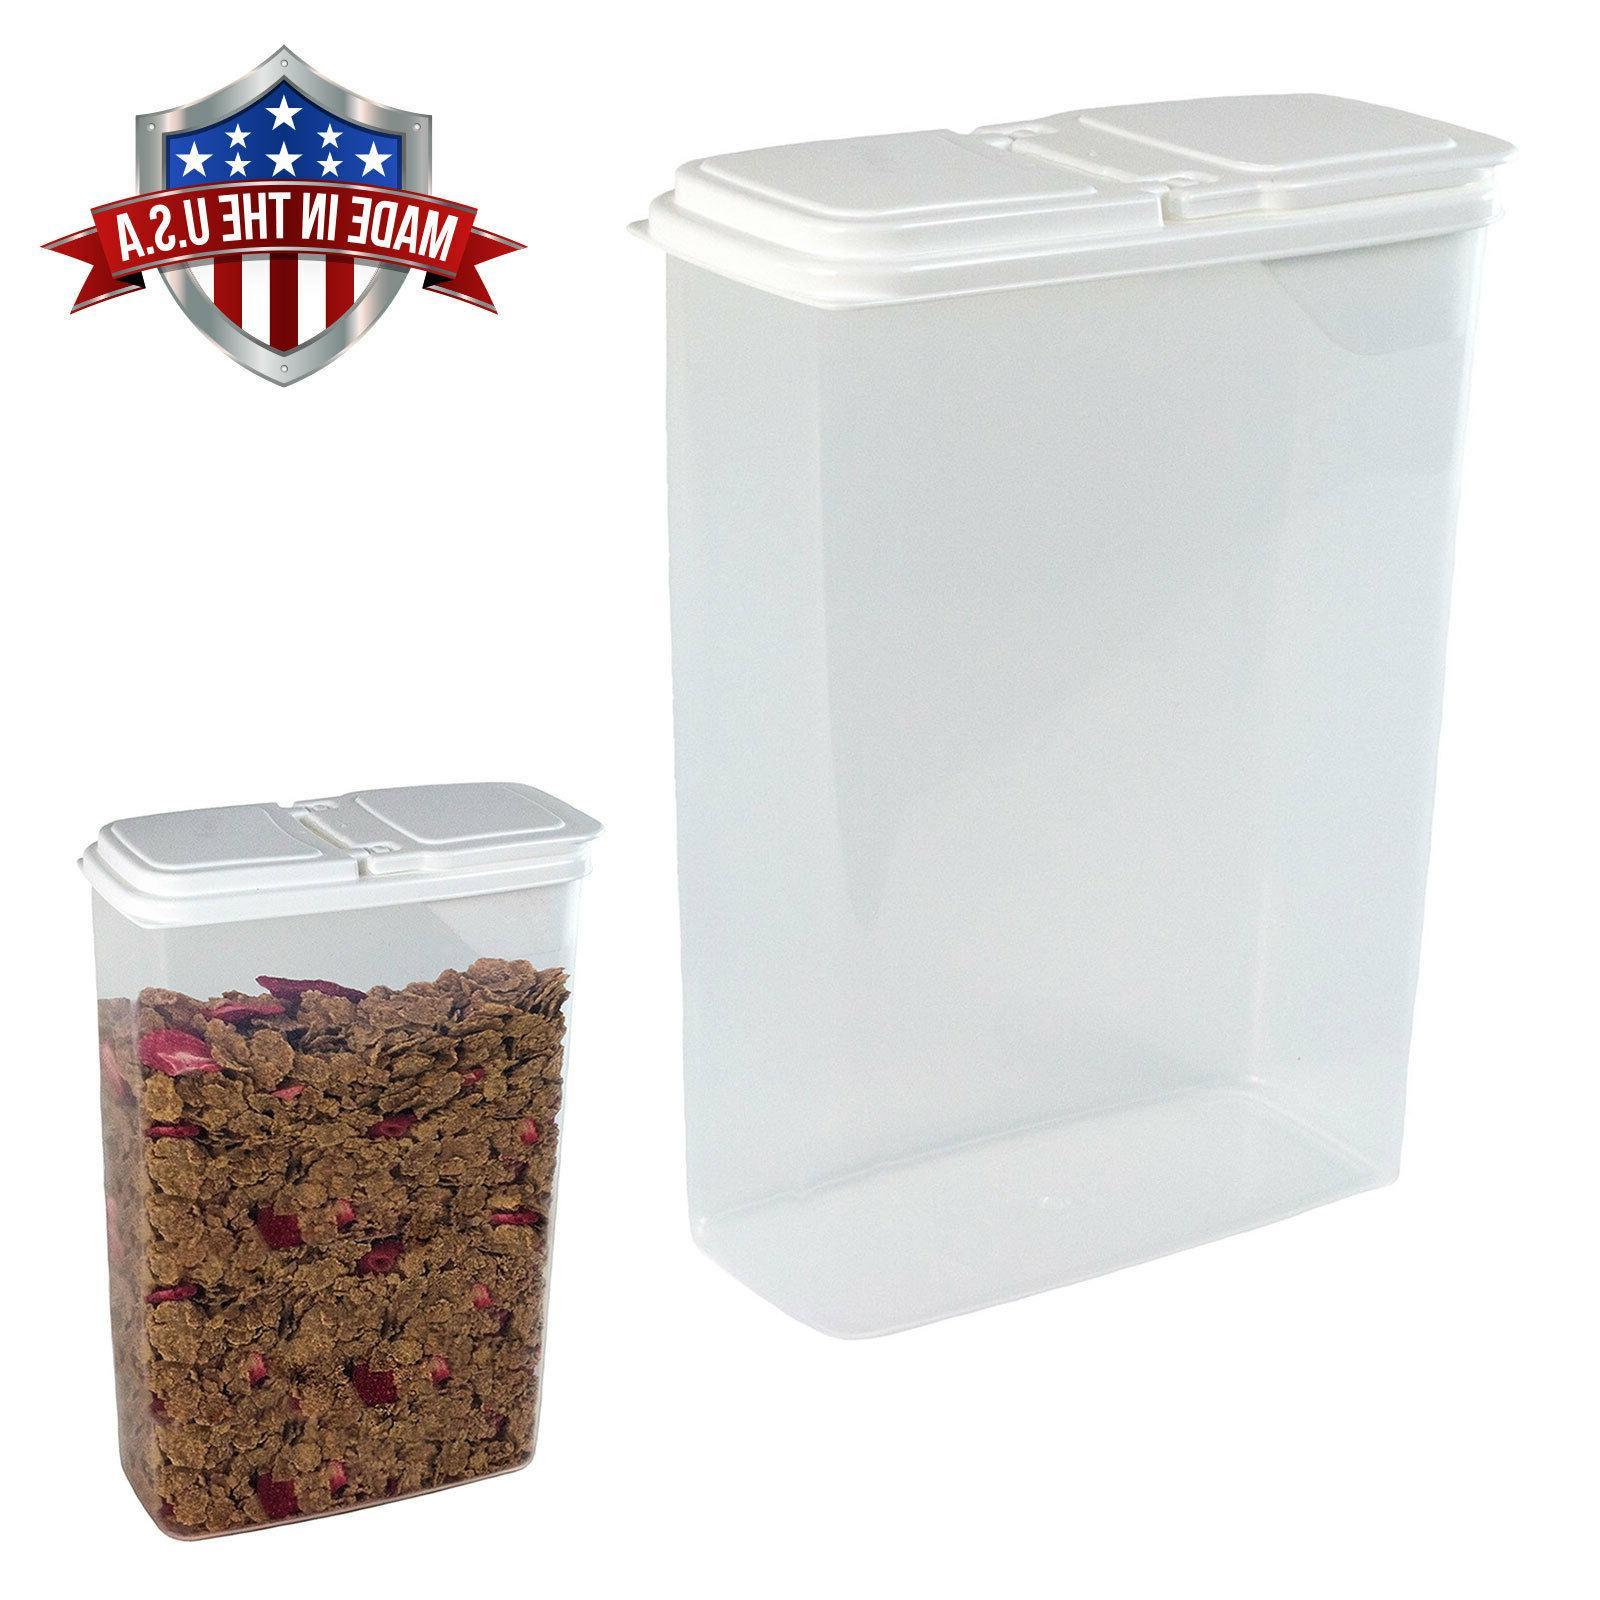 Large 4 Qt Cereal, Snack Keeper Food Storage Dispenser Conta